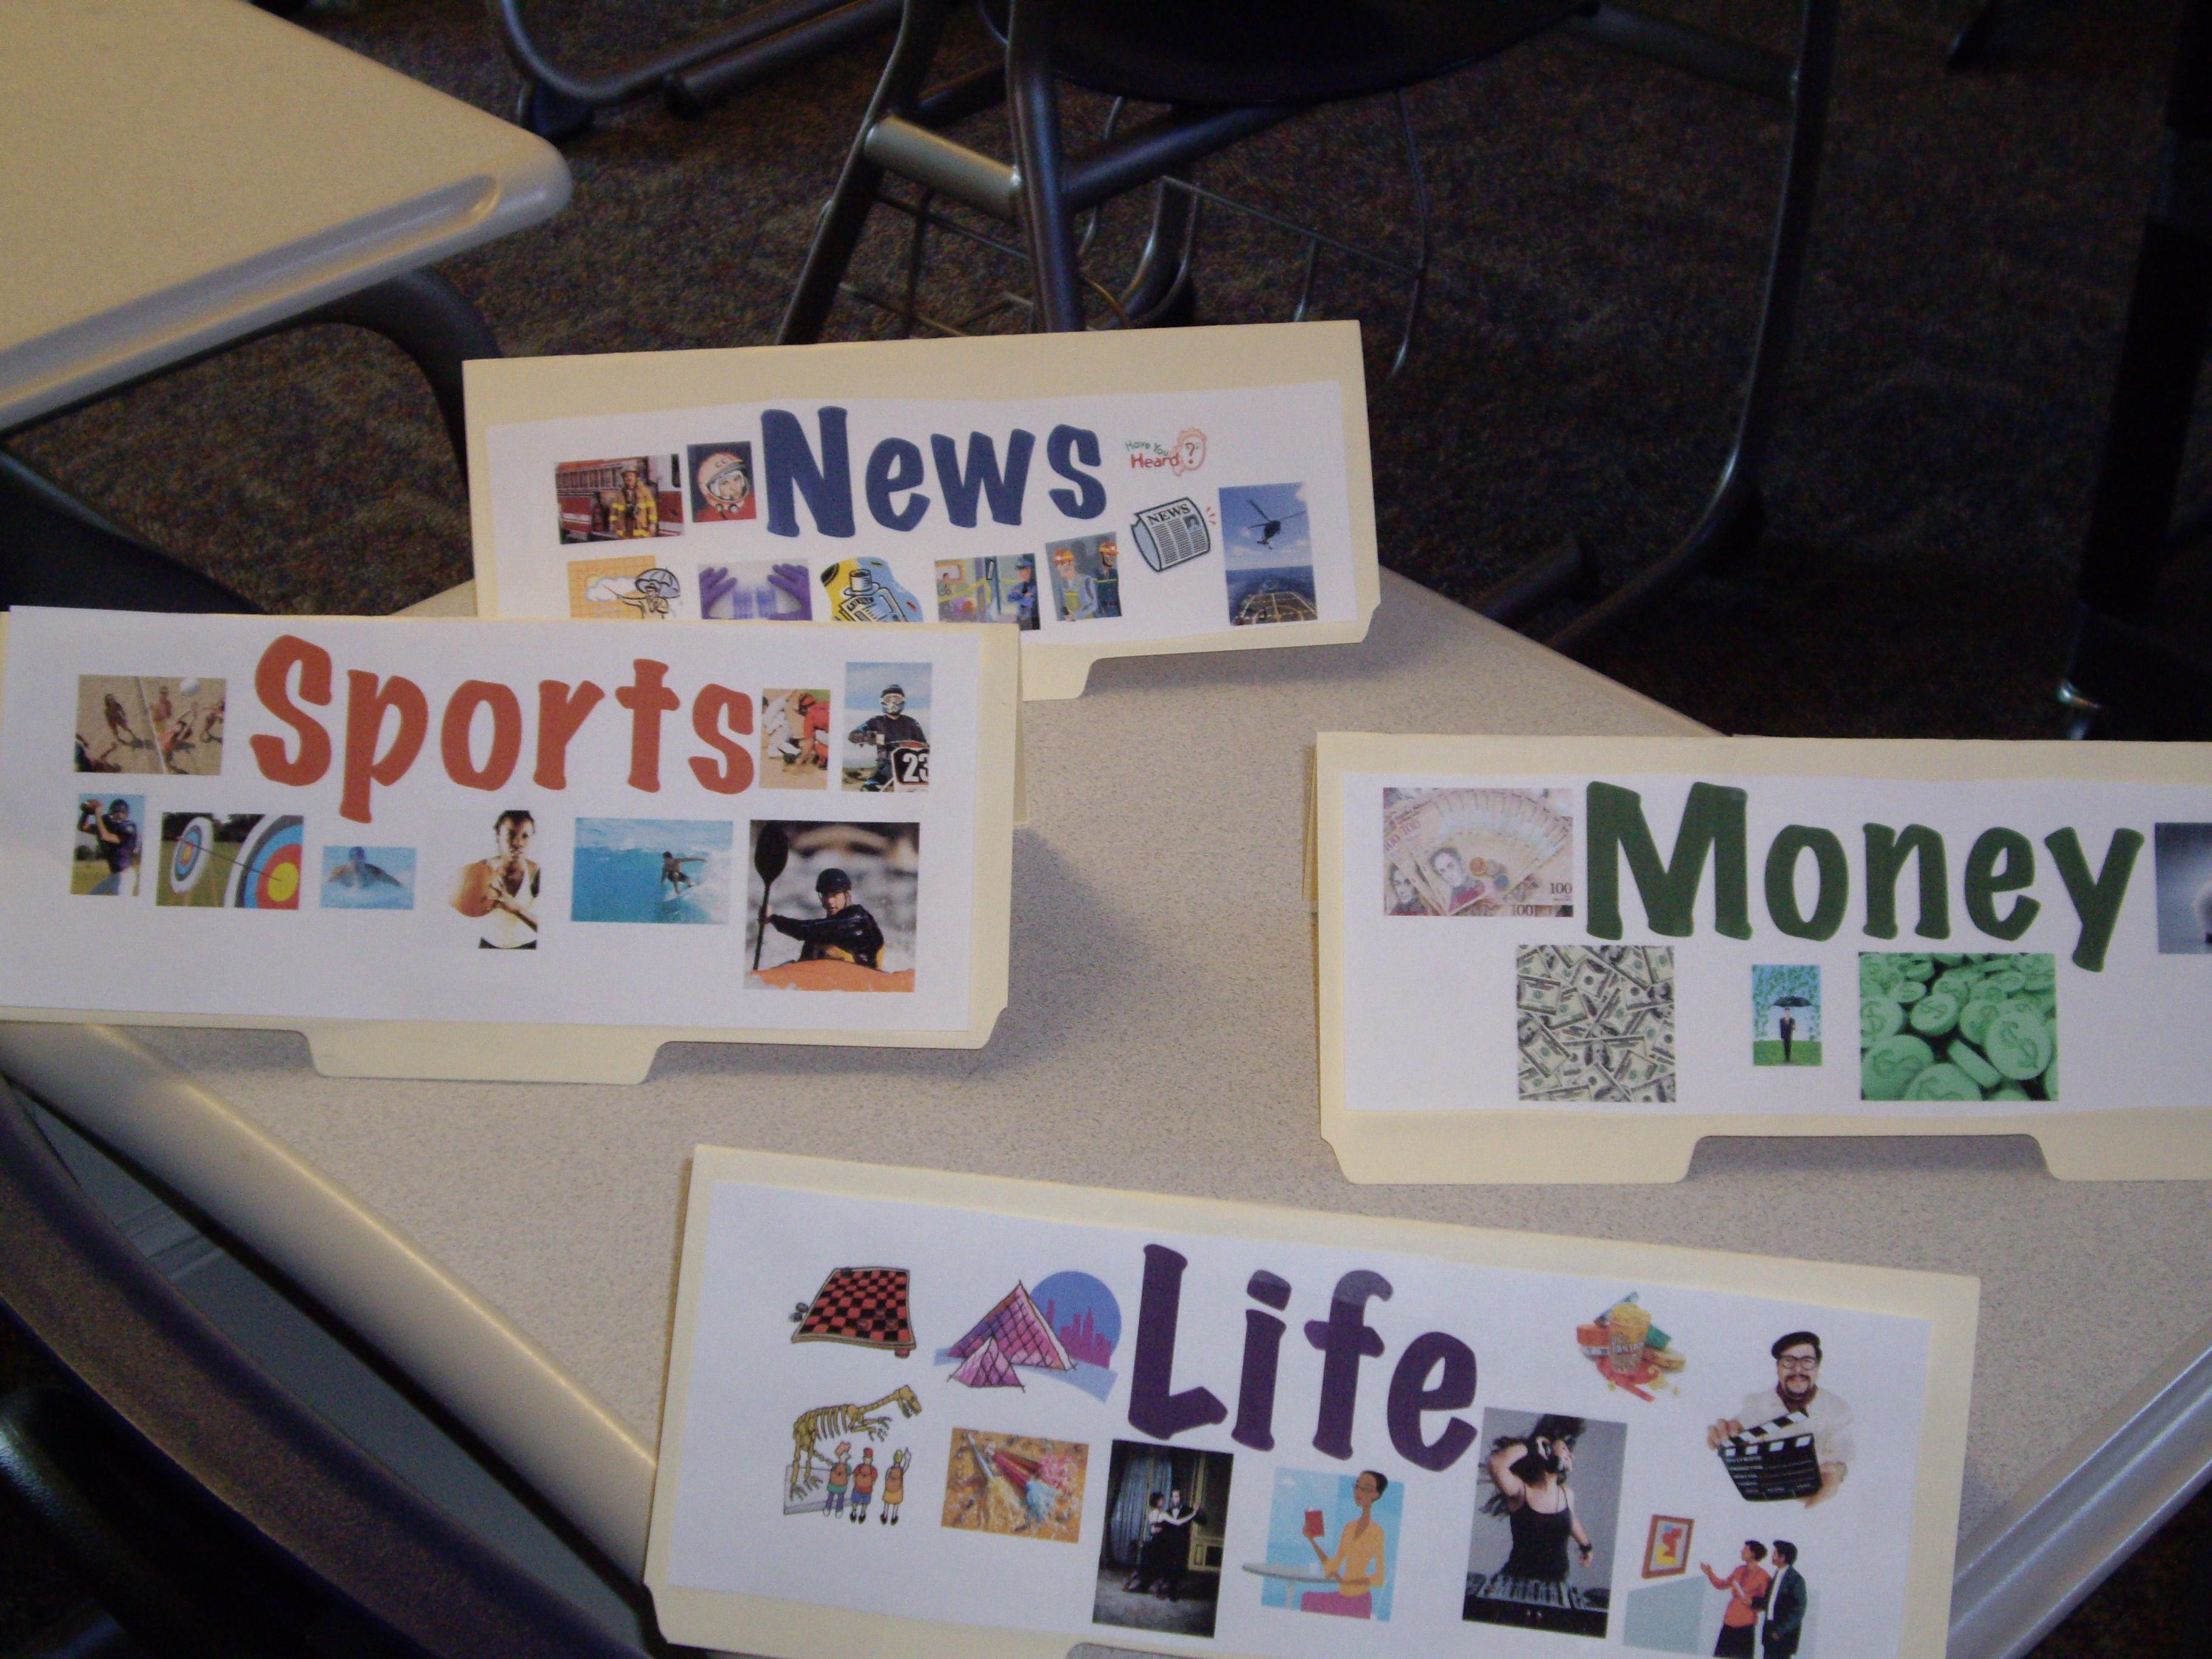 Newspapers in Classrooms | Ellclassroom